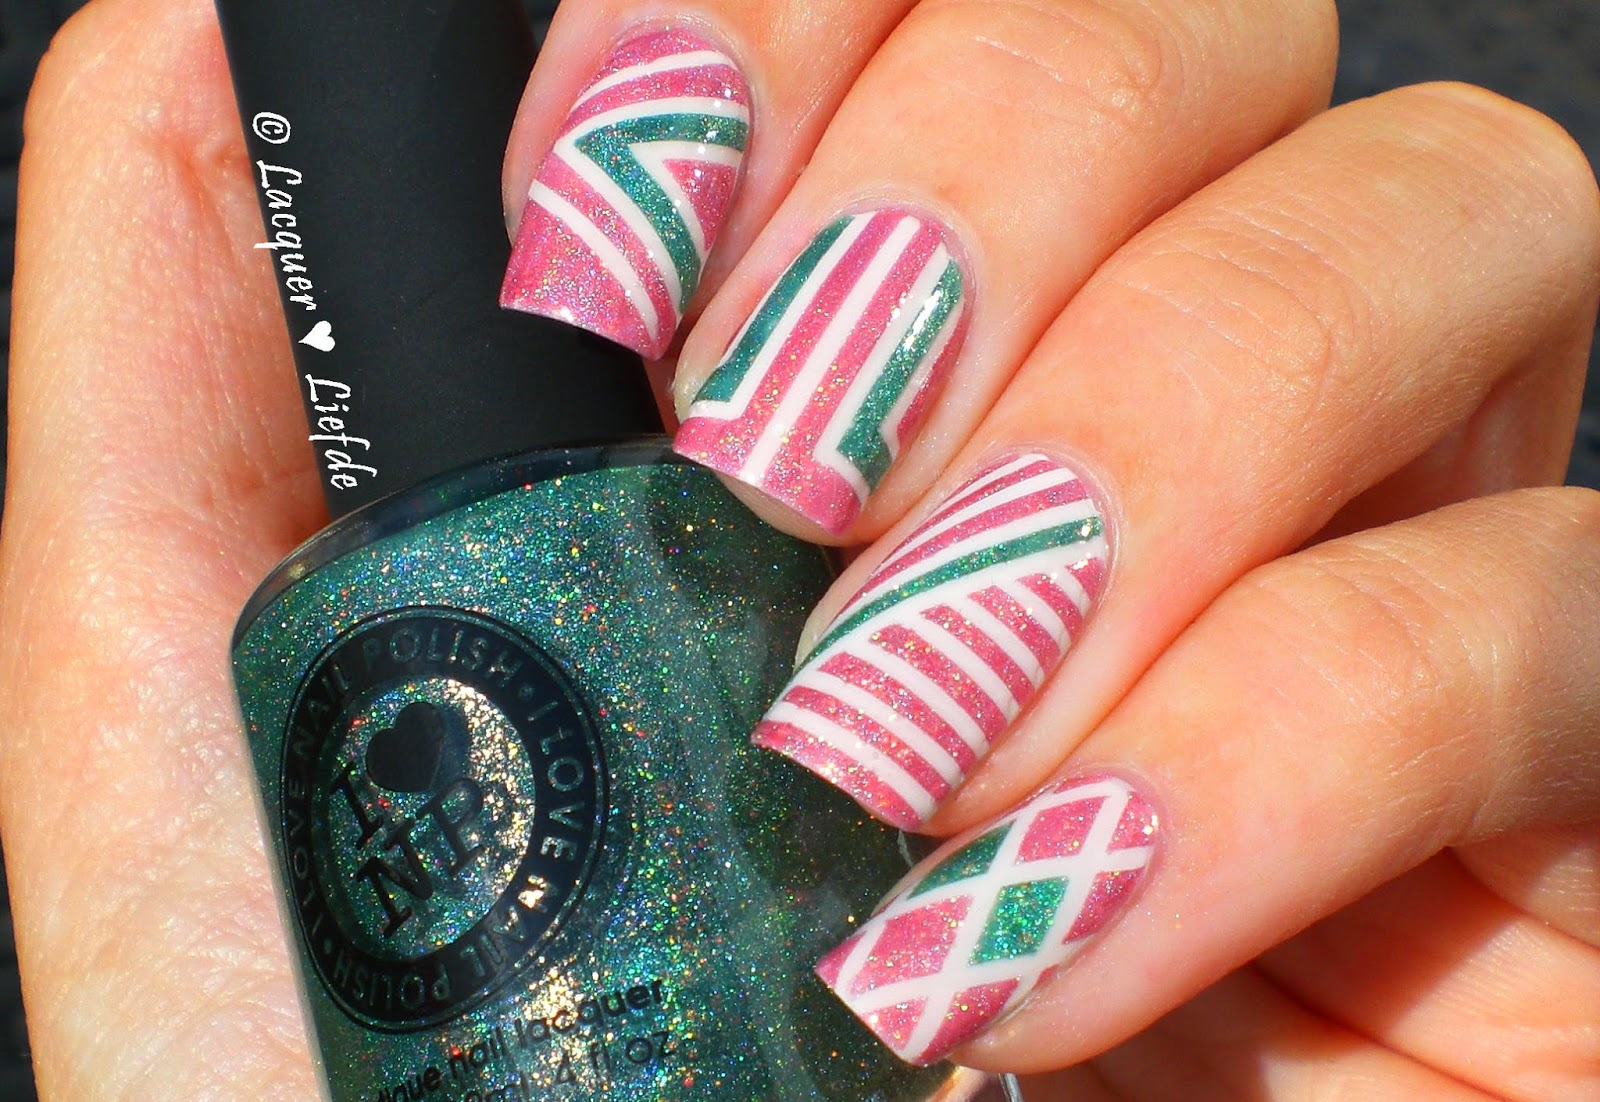 I Love Nail Polish